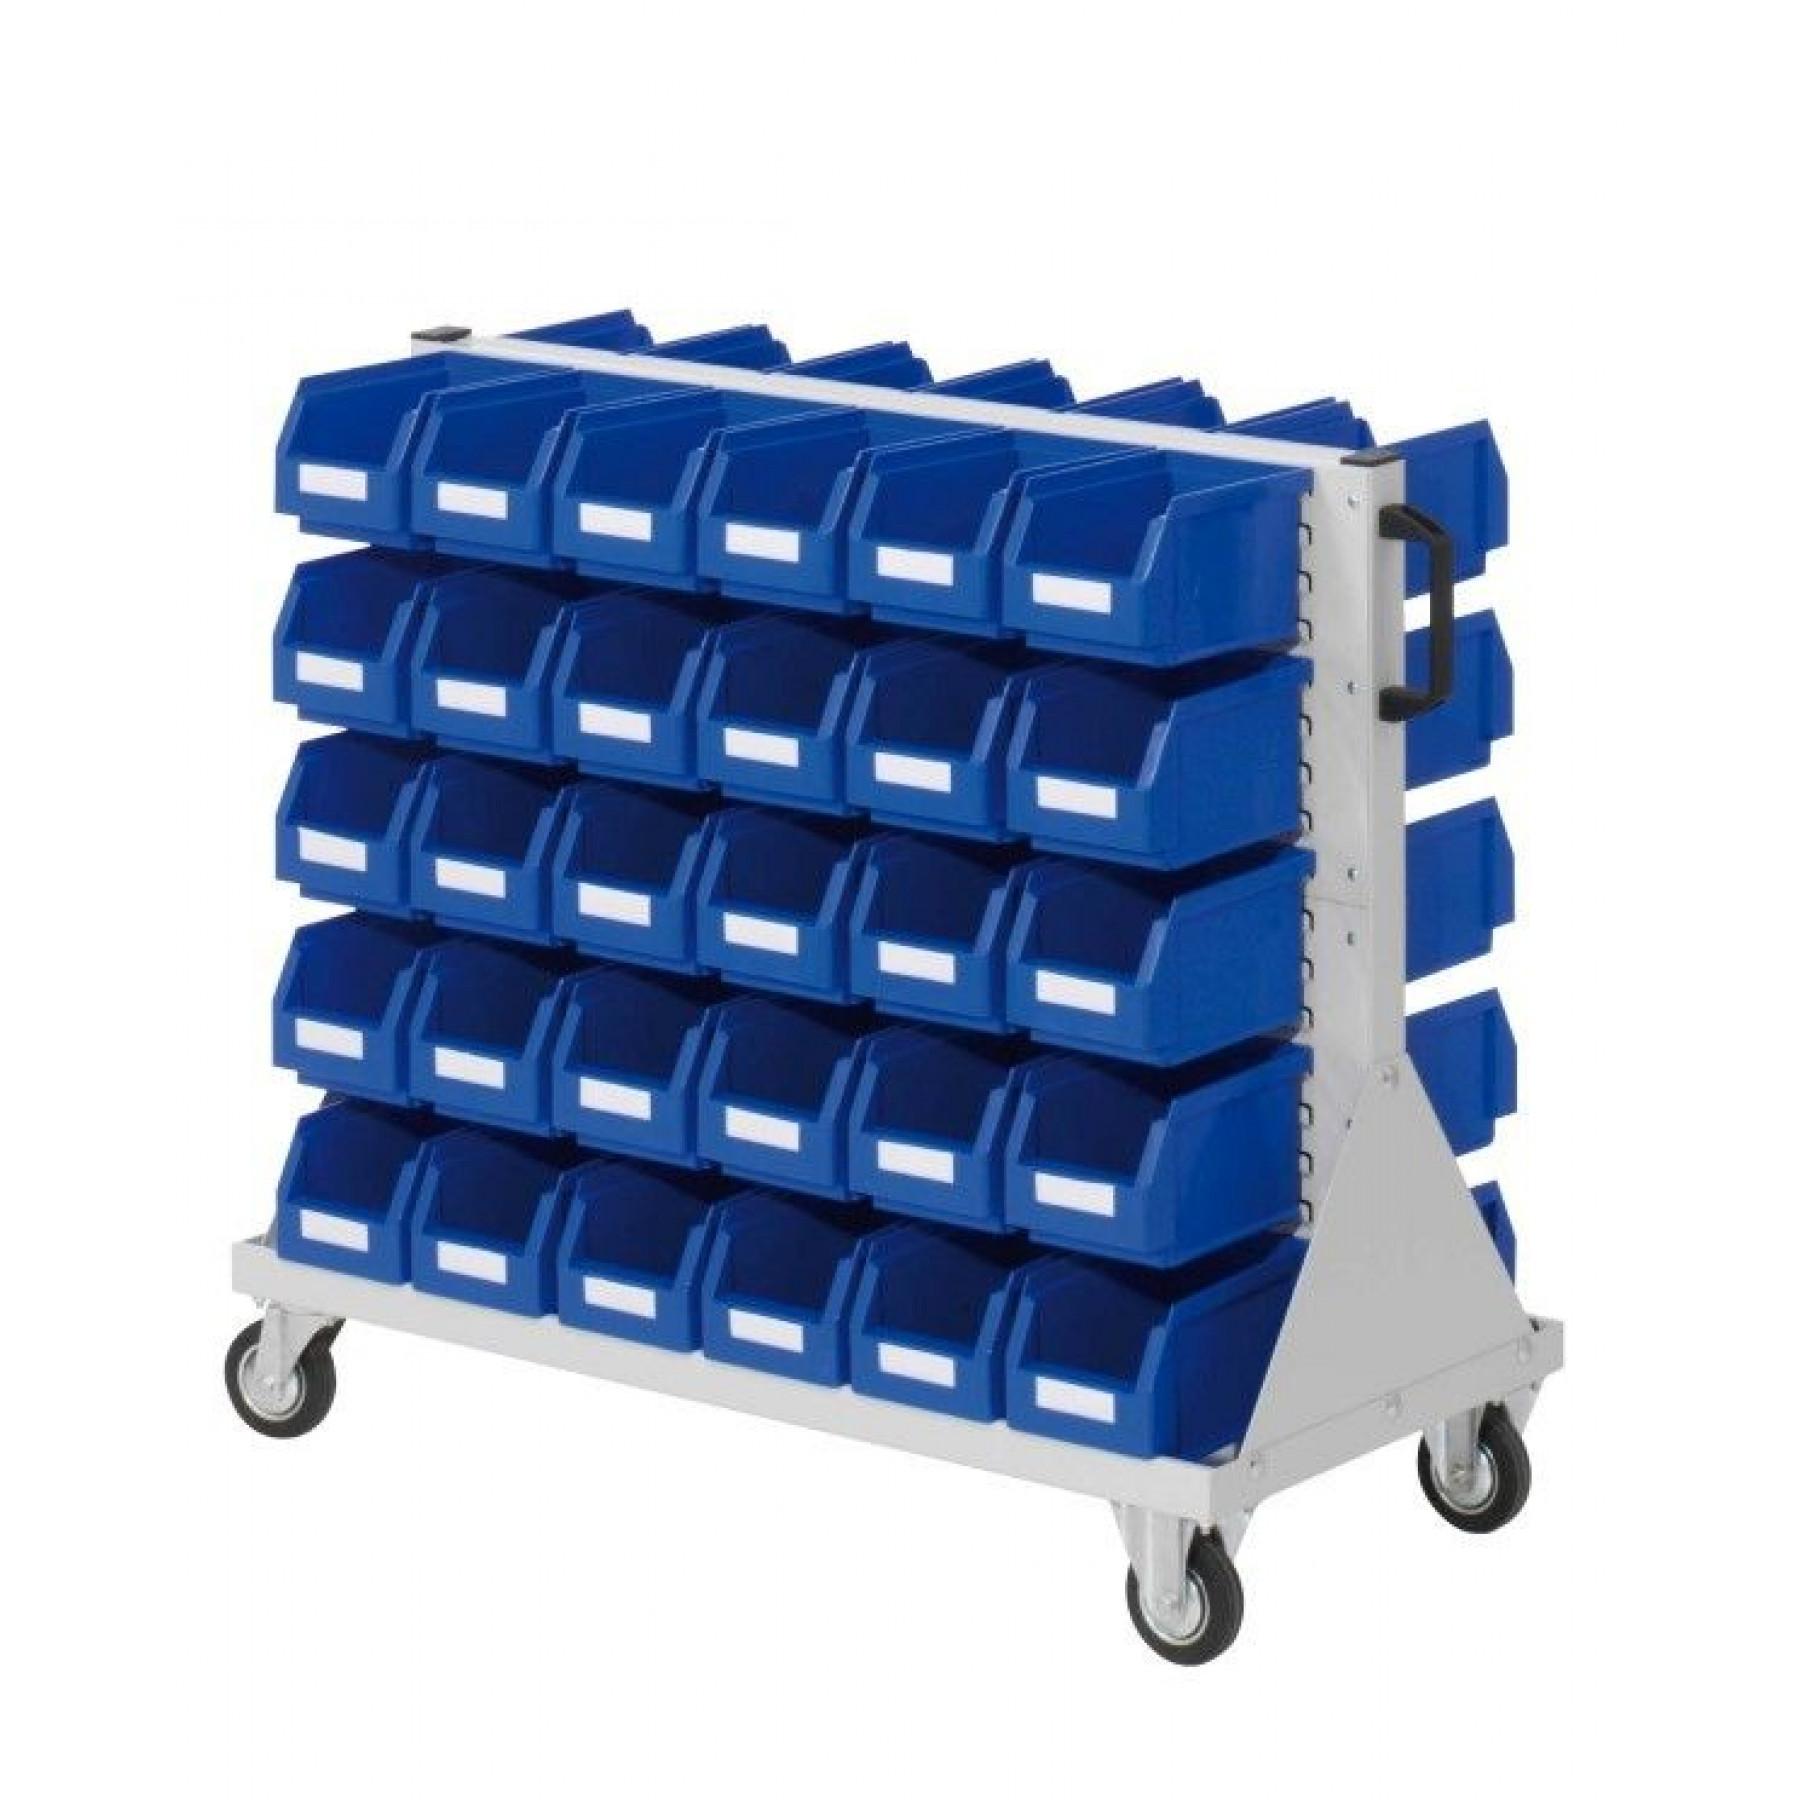 RasterMobil® rijdende bakkenstelling 1000x500x890 mm (LxBxH), 7020.03.0913